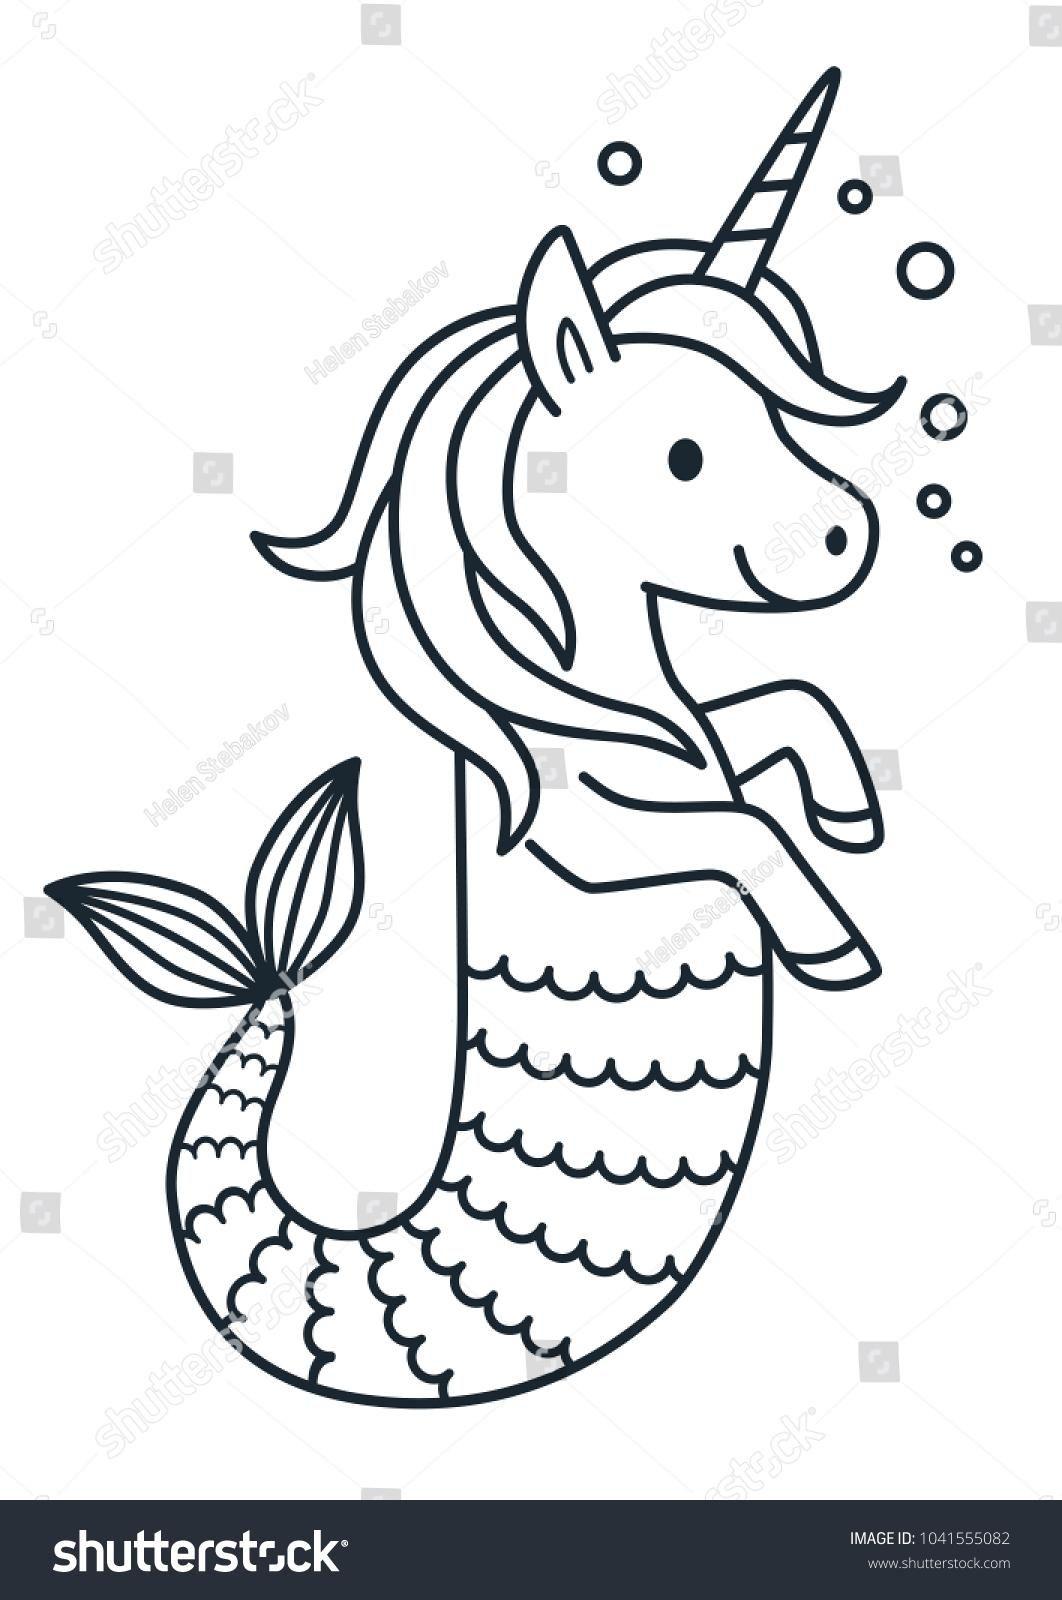 51 Coloring Page Unicorn Mermaid Mermaid Coloring Book Mermaid Coloring Pages Unicorn Coloring Pages